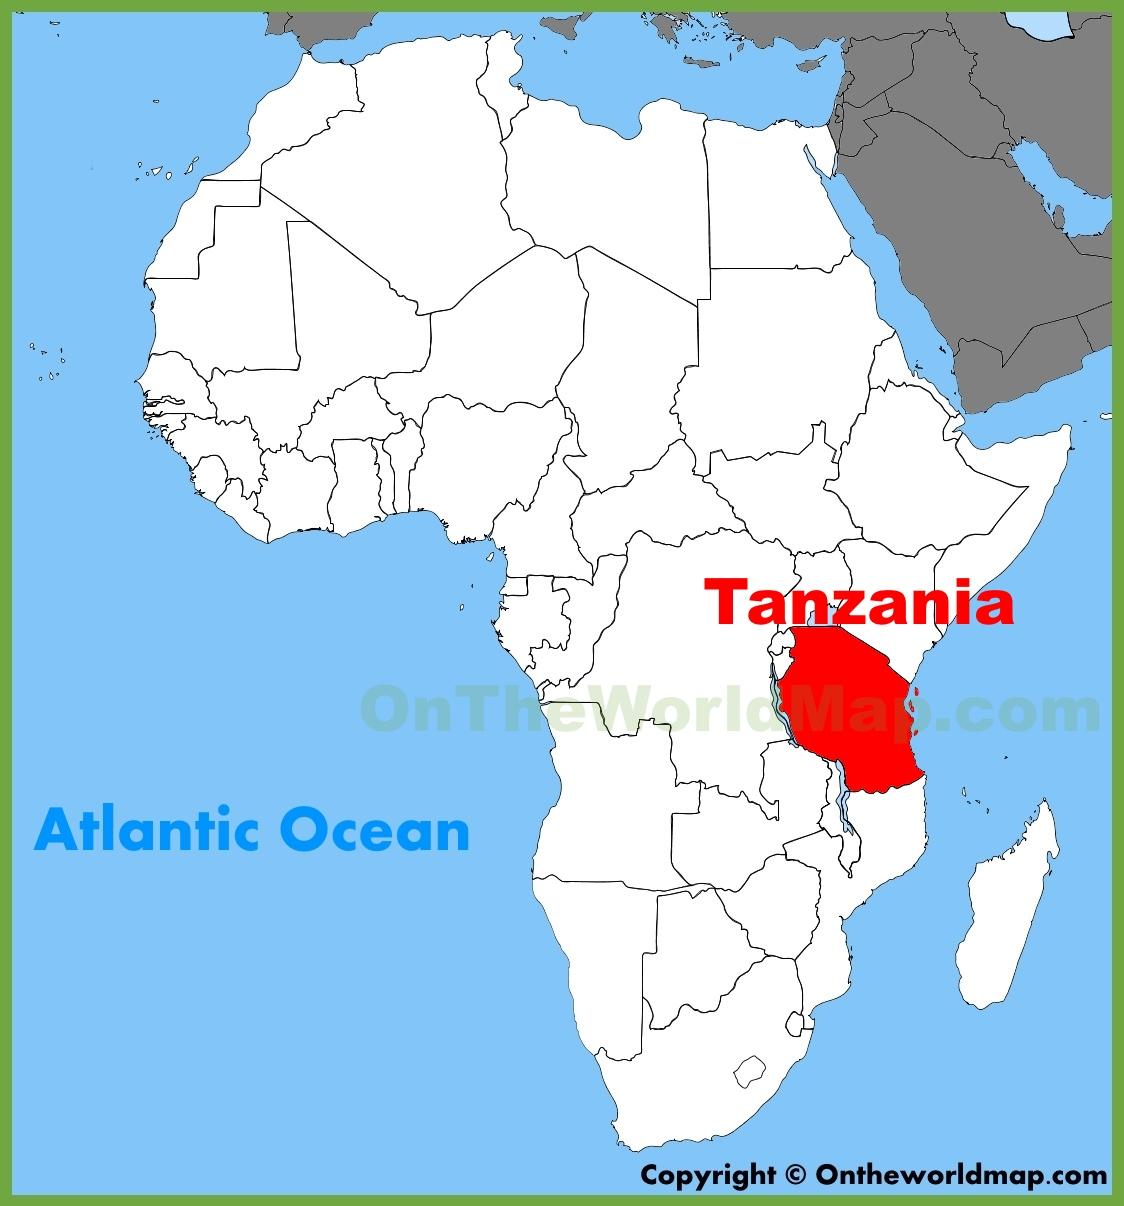 Tanzania Africa Map Tanzania location on the Africa map